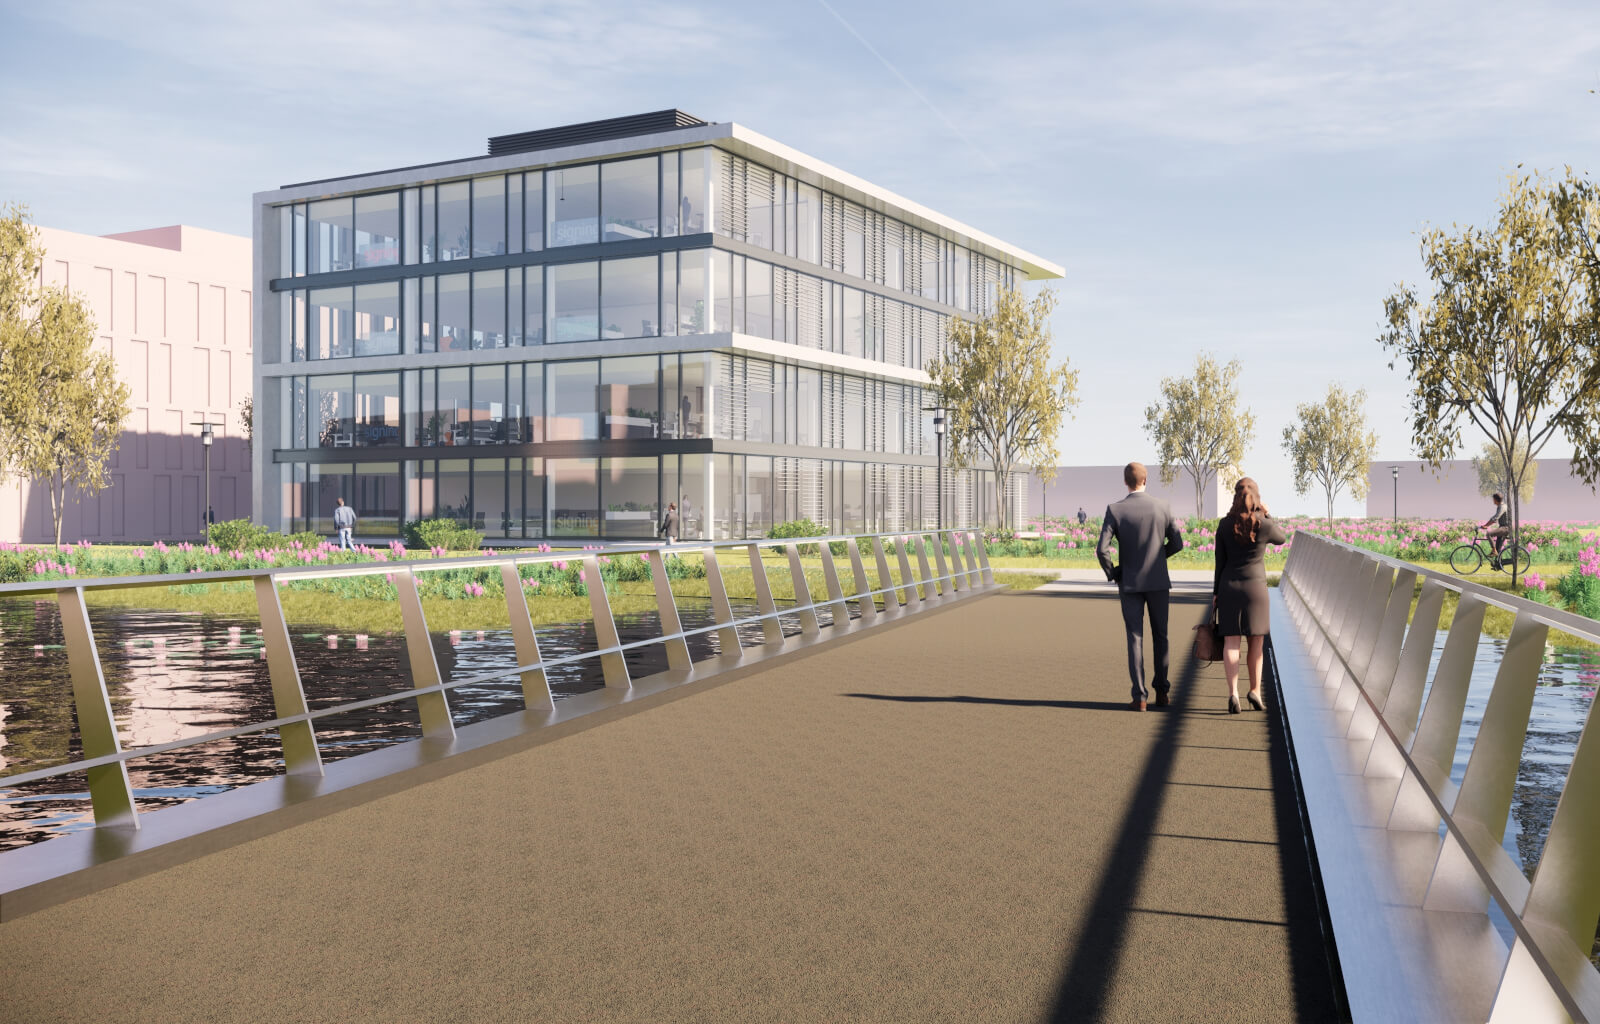 Zens building at High Tech Campus 85